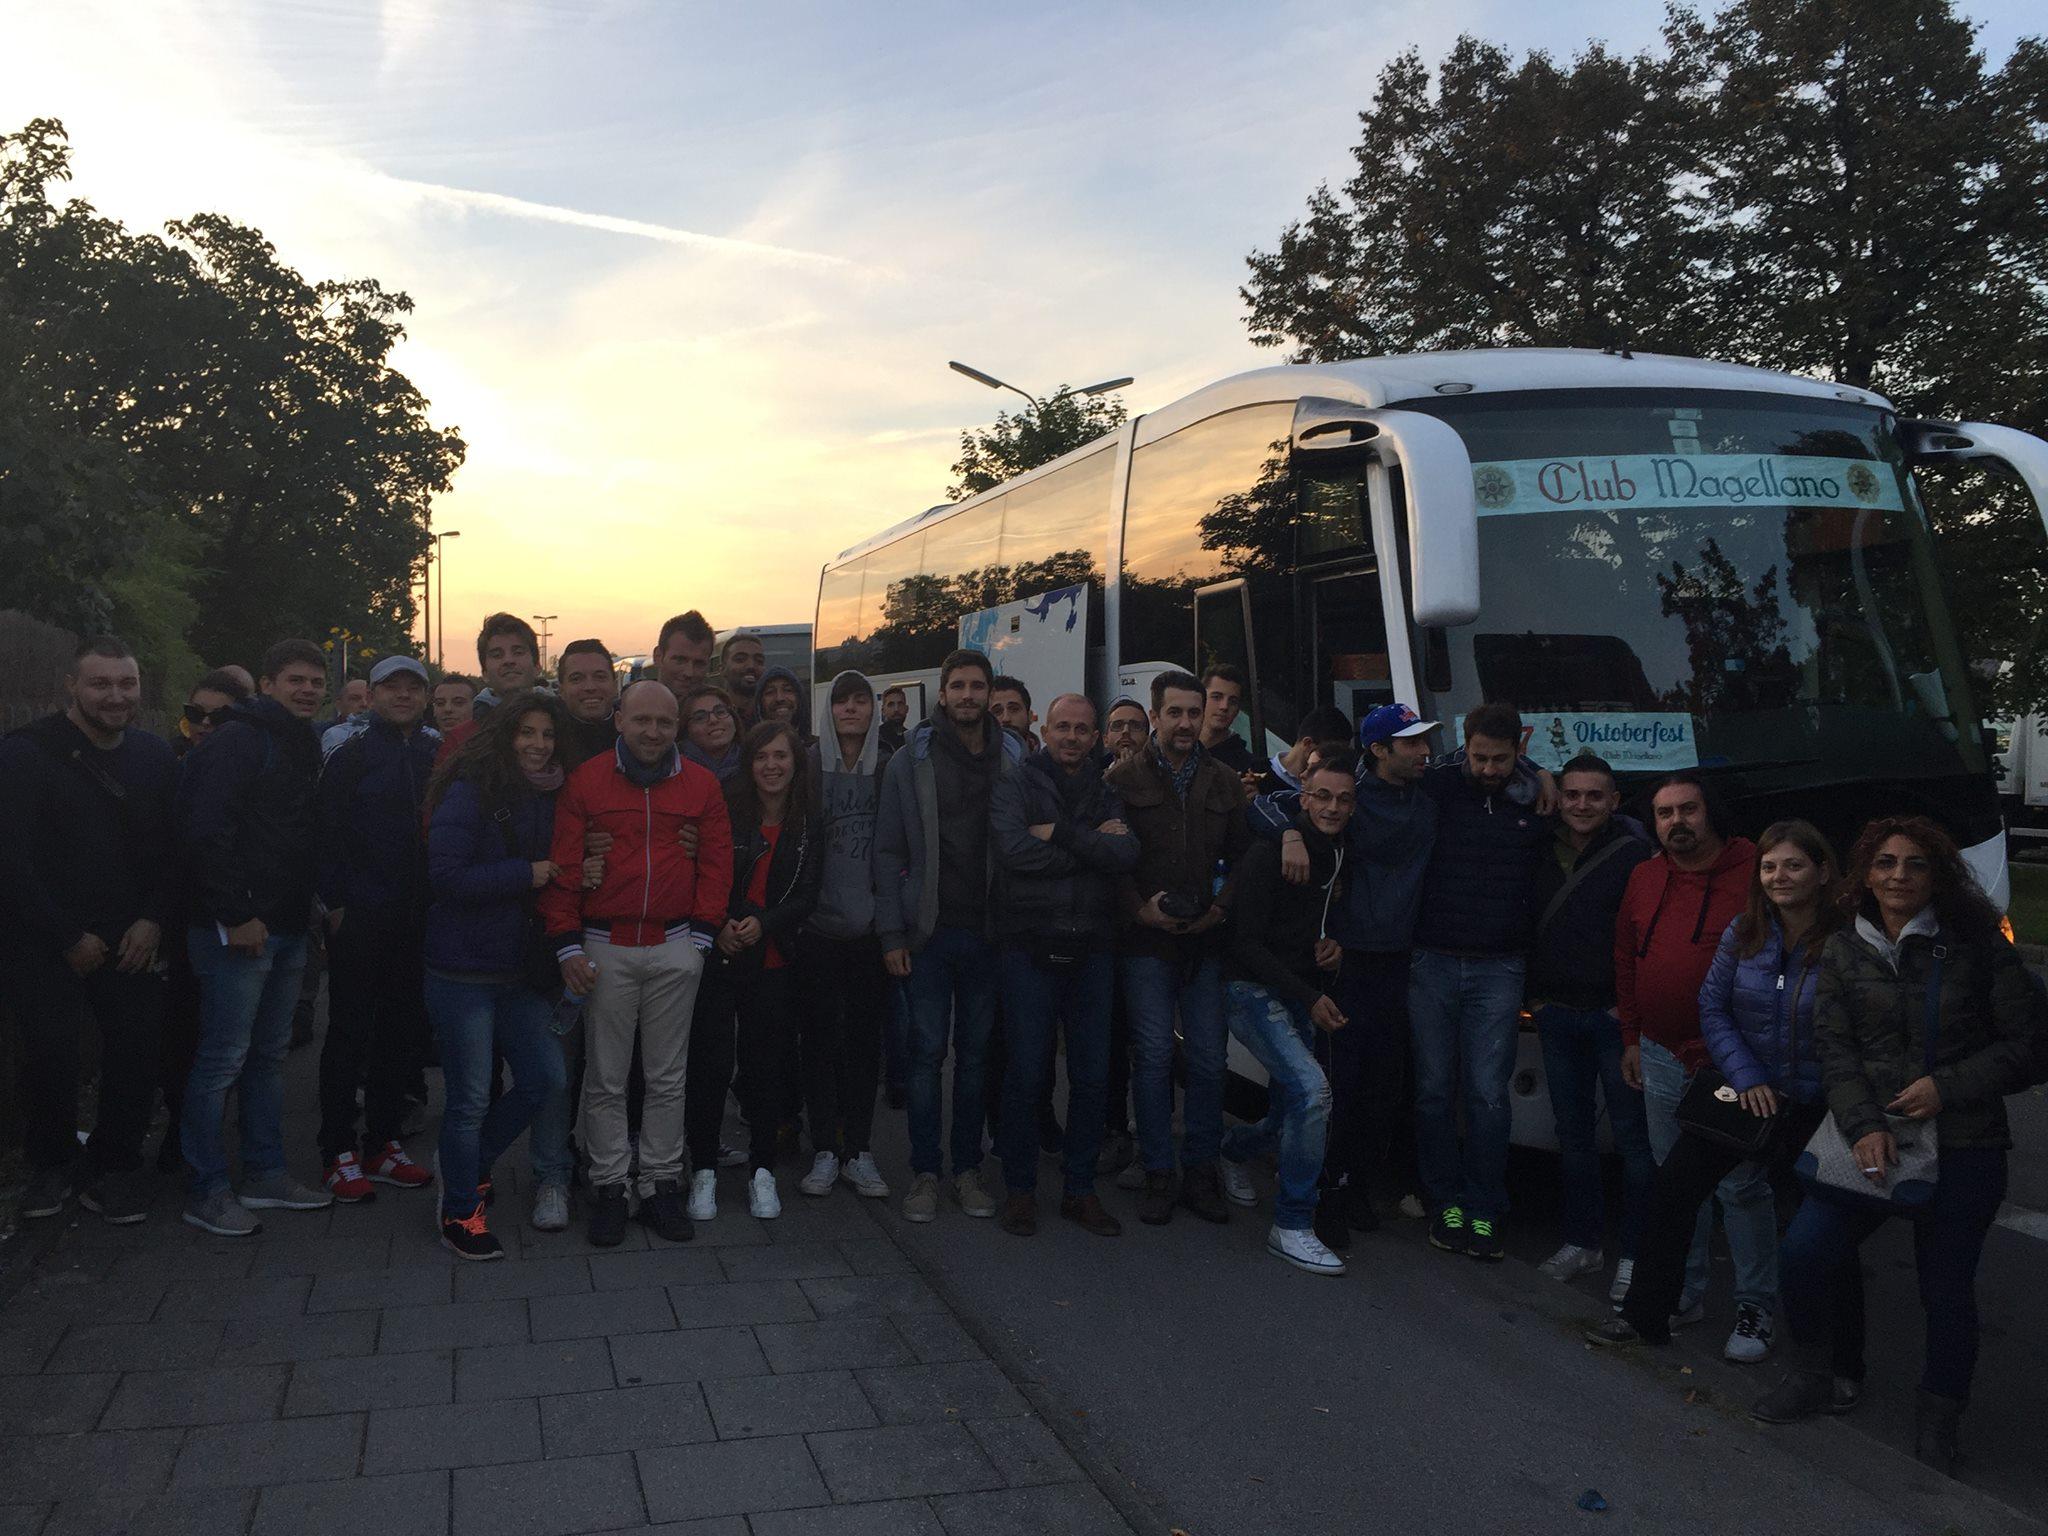 bus129-oktoberfest-clubmagellano